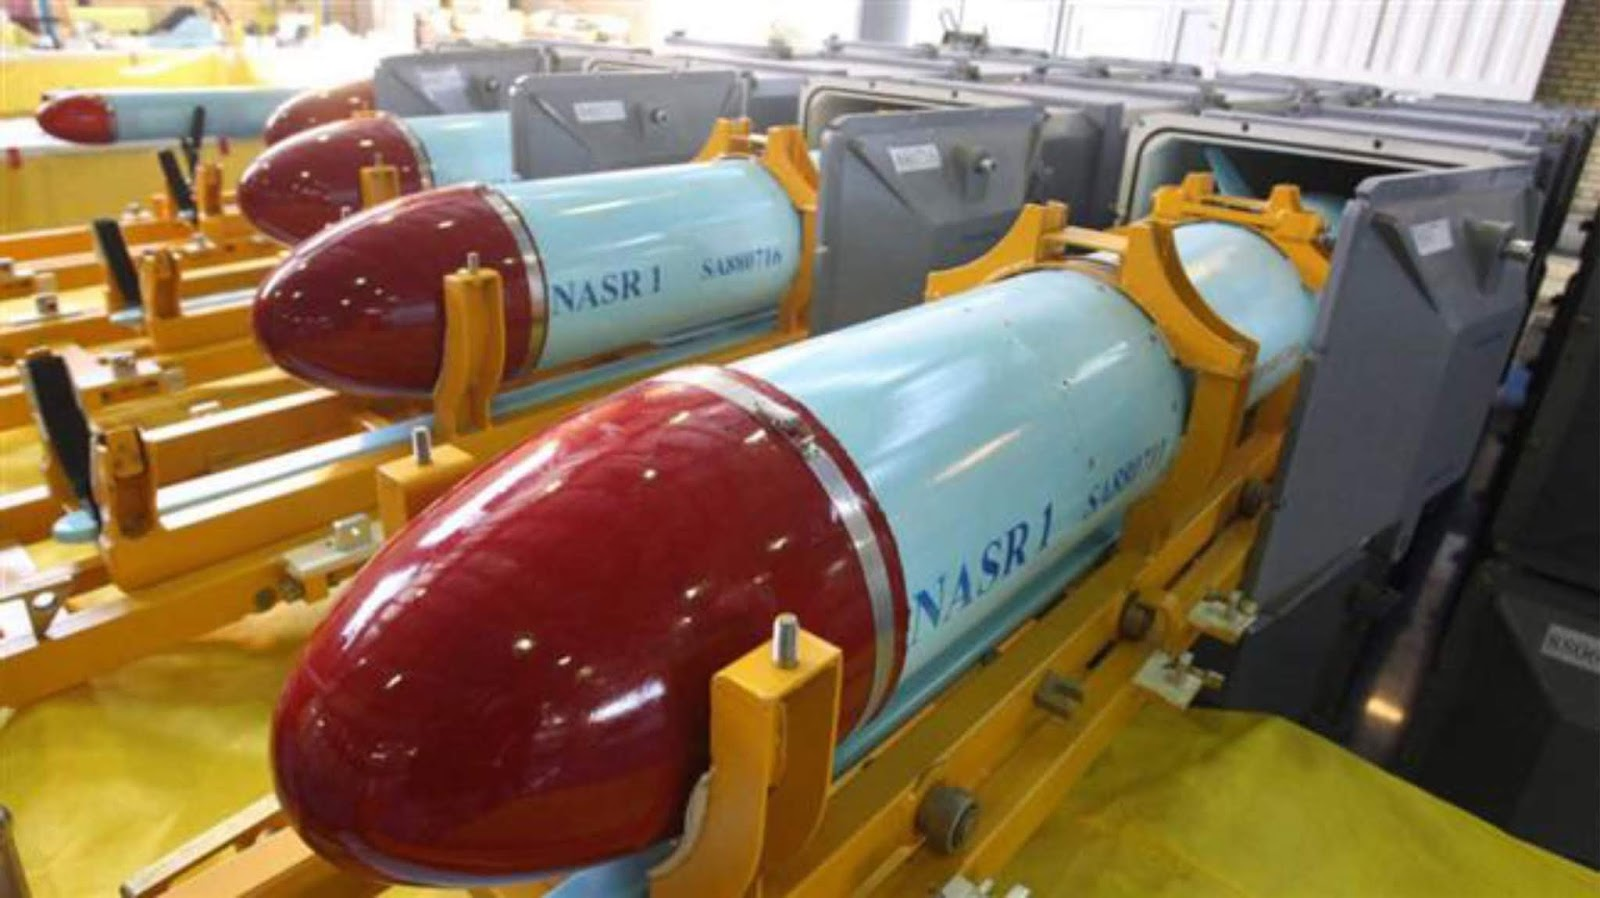 Pesawat tempur Sukhoi Iran akan di pasangi rudal jelajah